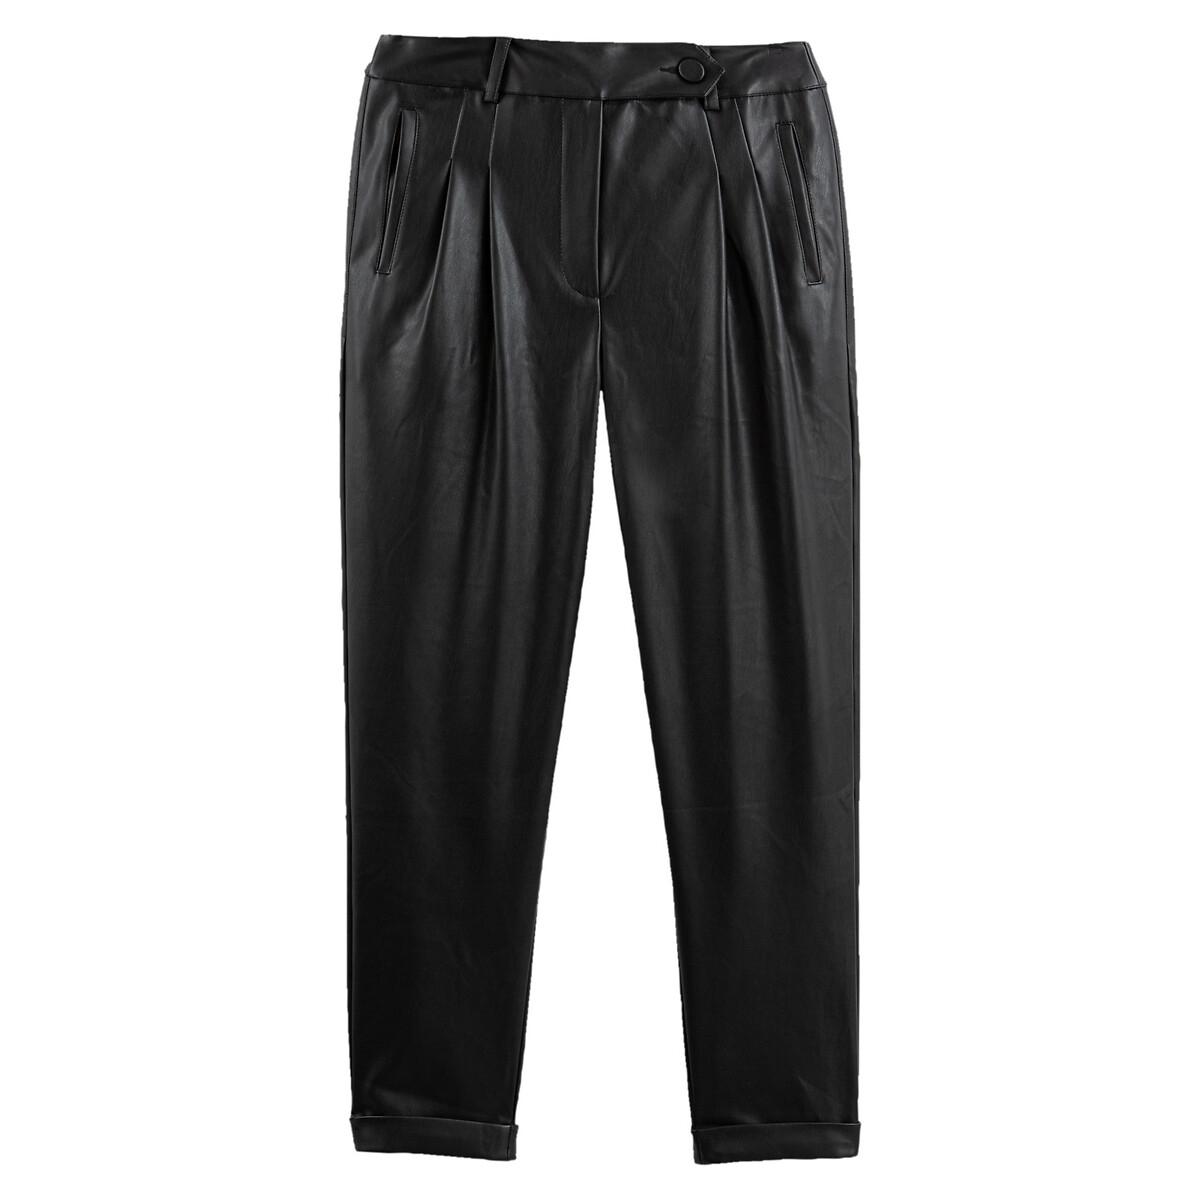 Pantalon à pinces en simili